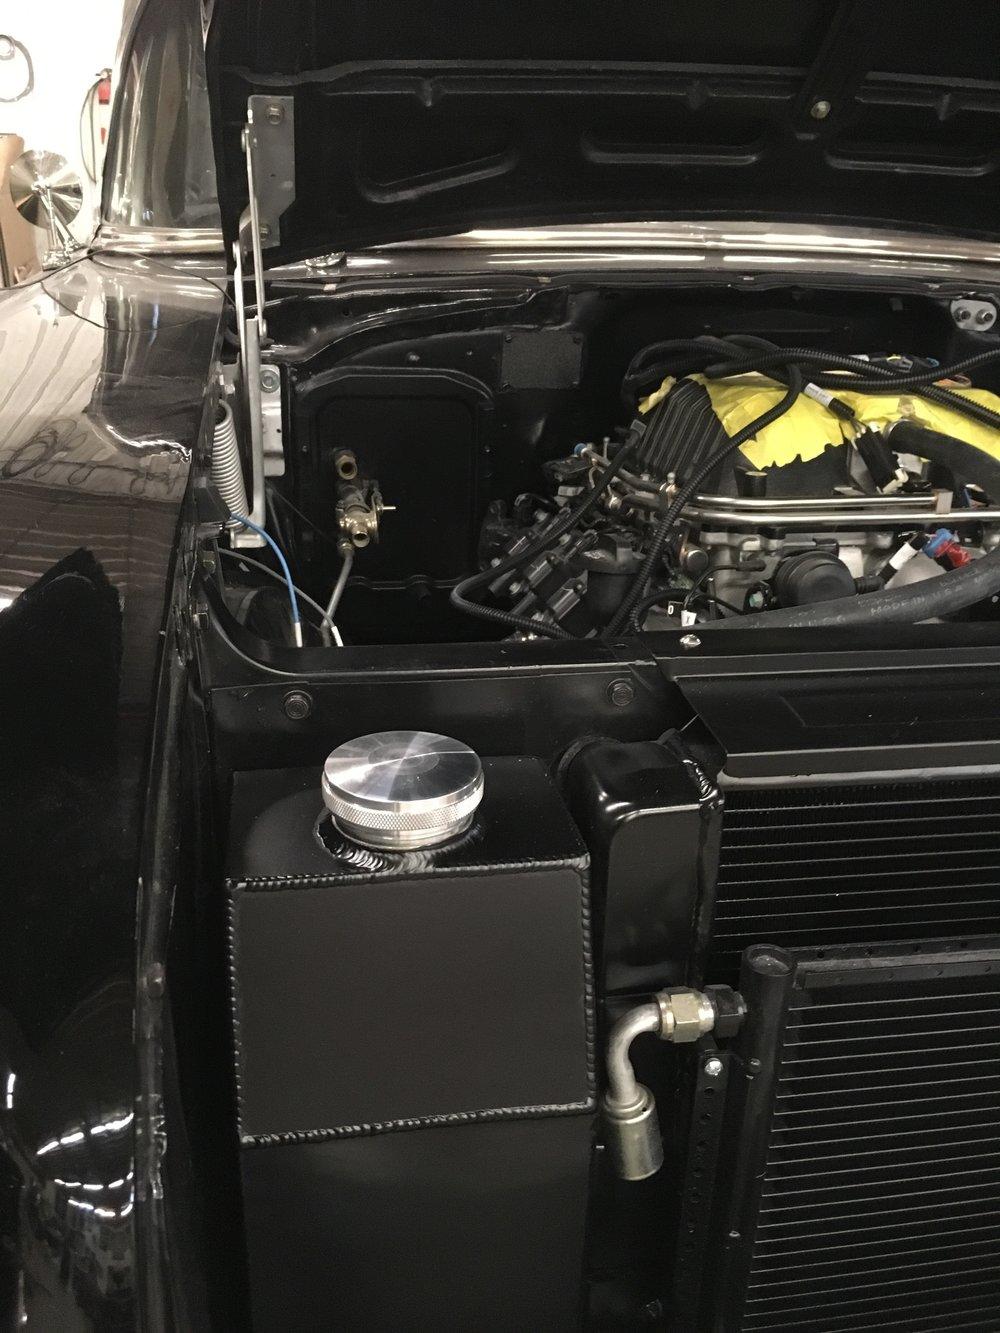 1957-Nomad-minneapolis-hot-rod-restoration-hot-rod-factory-engine.jpg